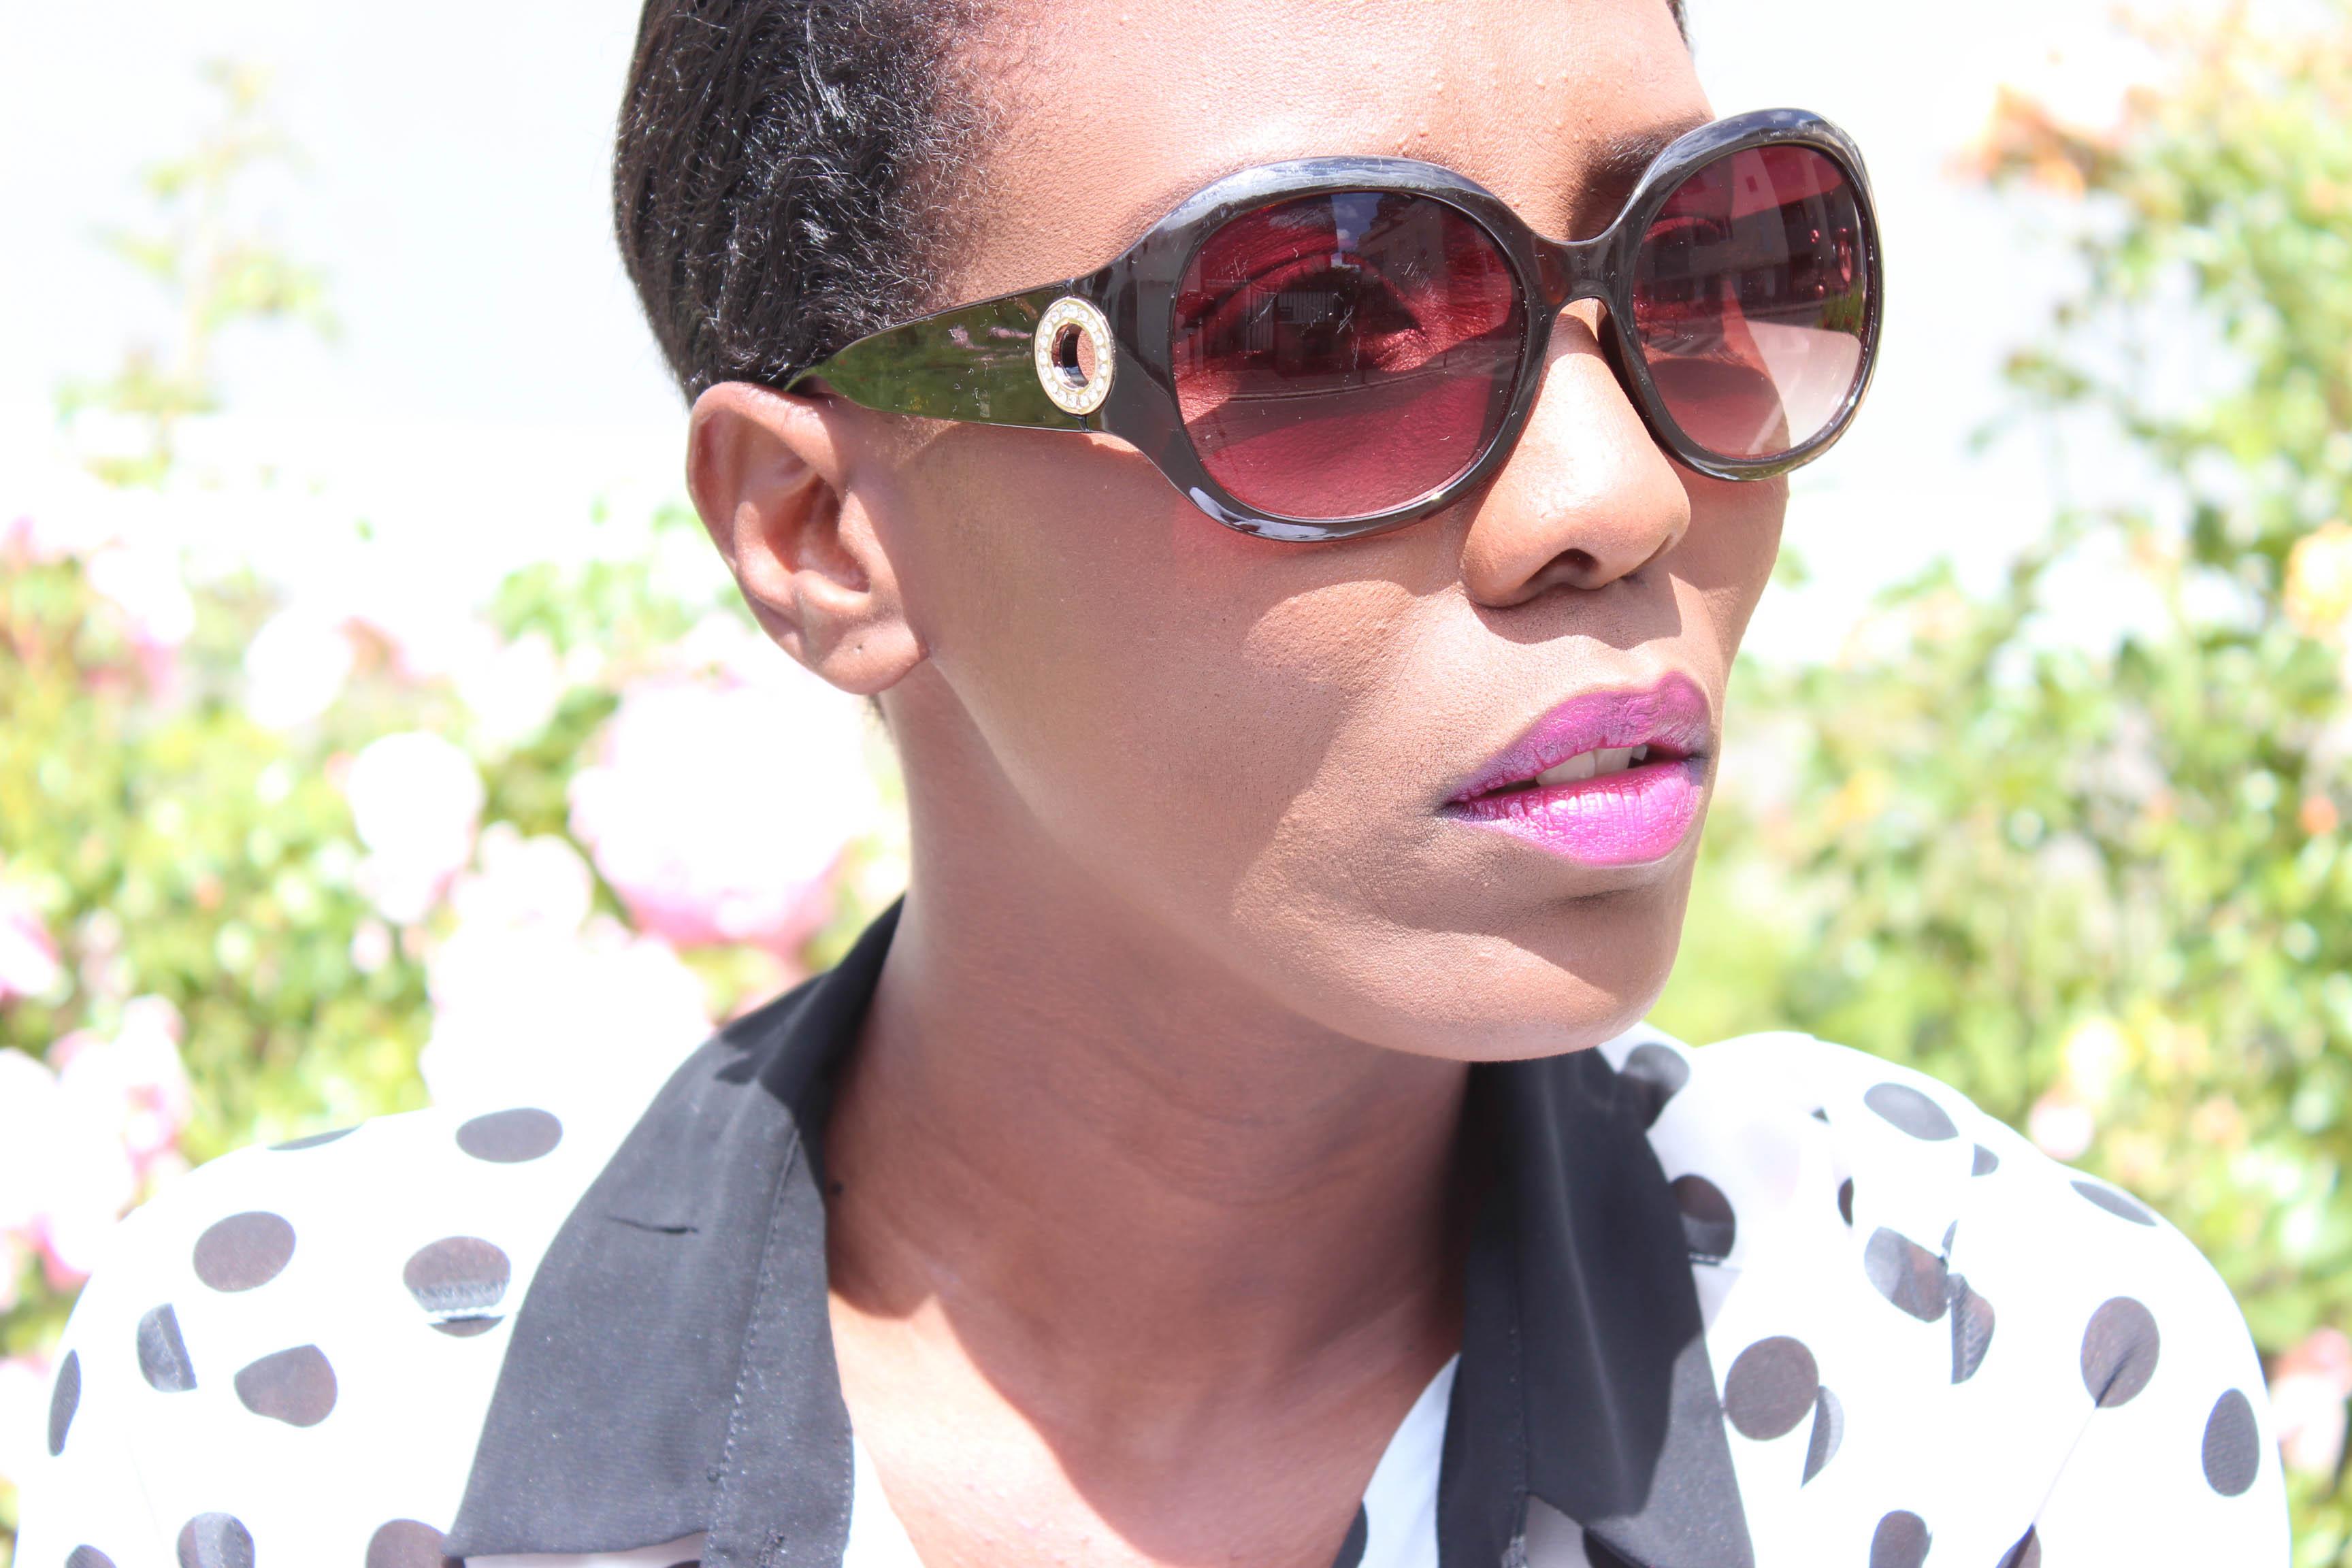 nunaavane-fashion-sunday-monochromes-bblogger-ctbb